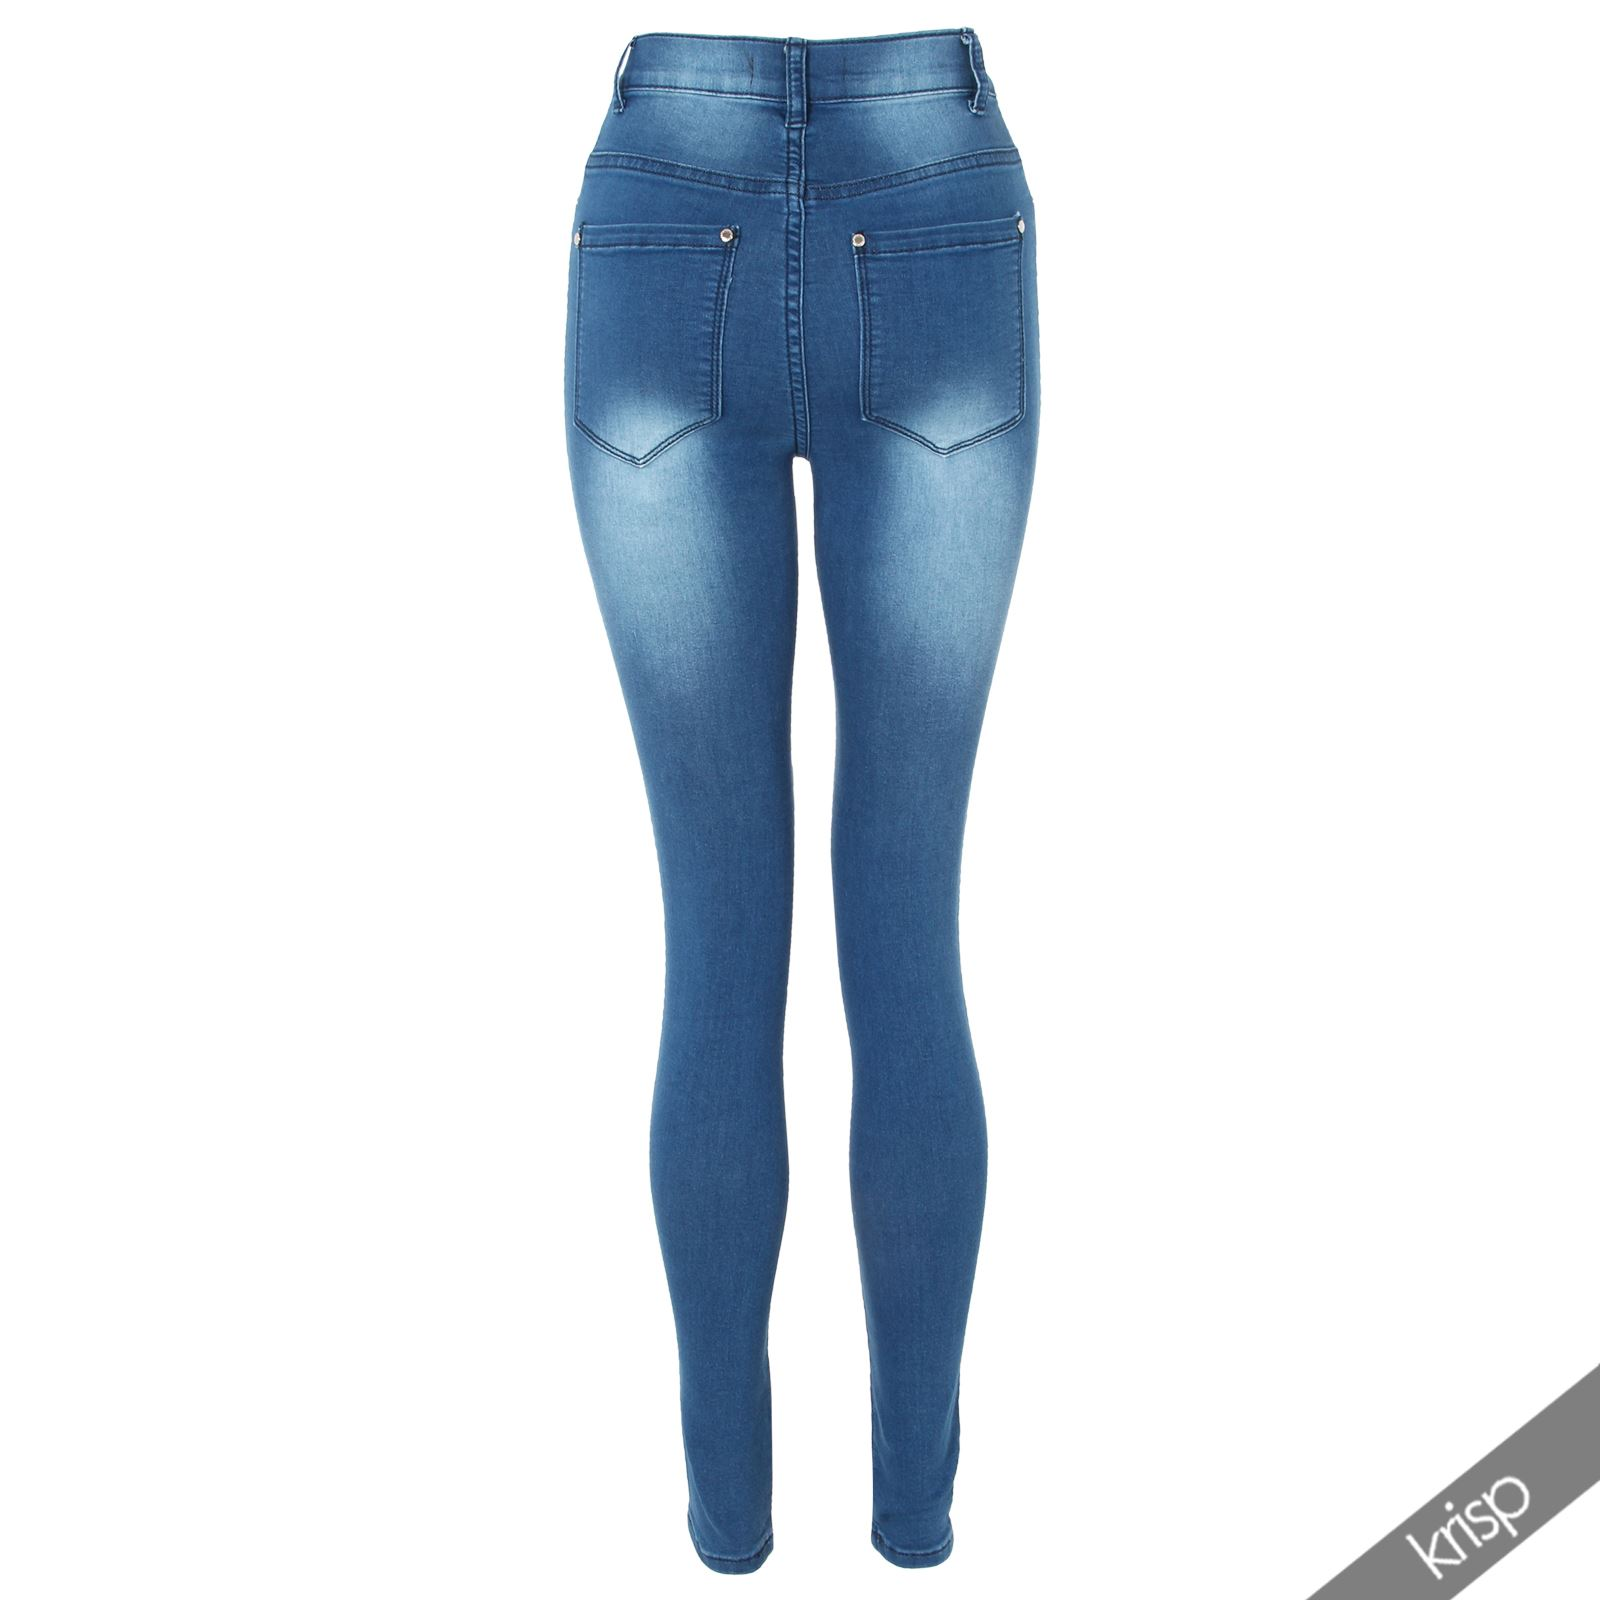 femmes jegging skinny jeans pantalon denim uni classique taille haute extensible. Black Bedroom Furniture Sets. Home Design Ideas